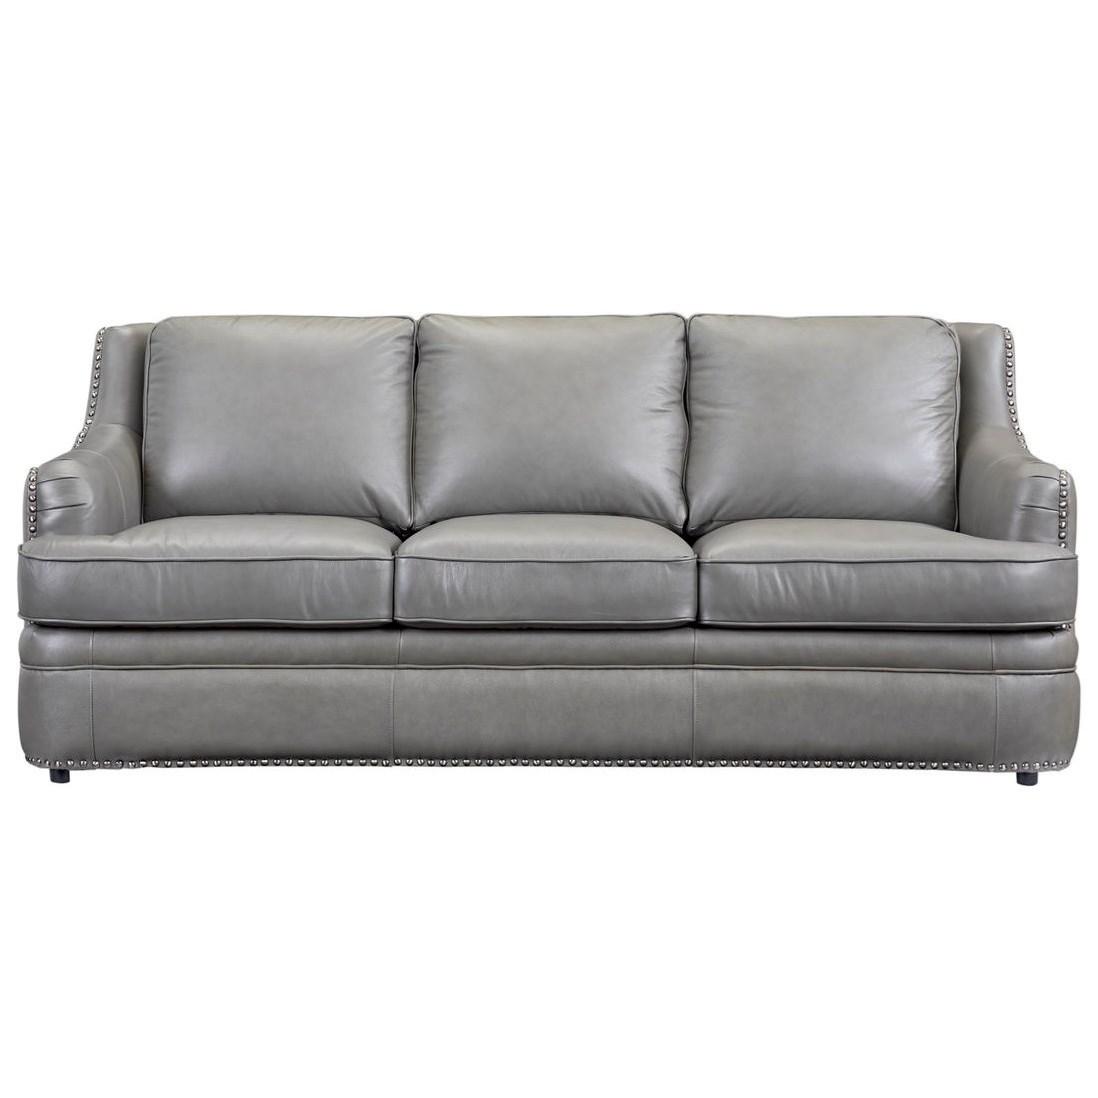 leather italia sofa furniture dfs half usa tulsa transitional roll arm miskelly